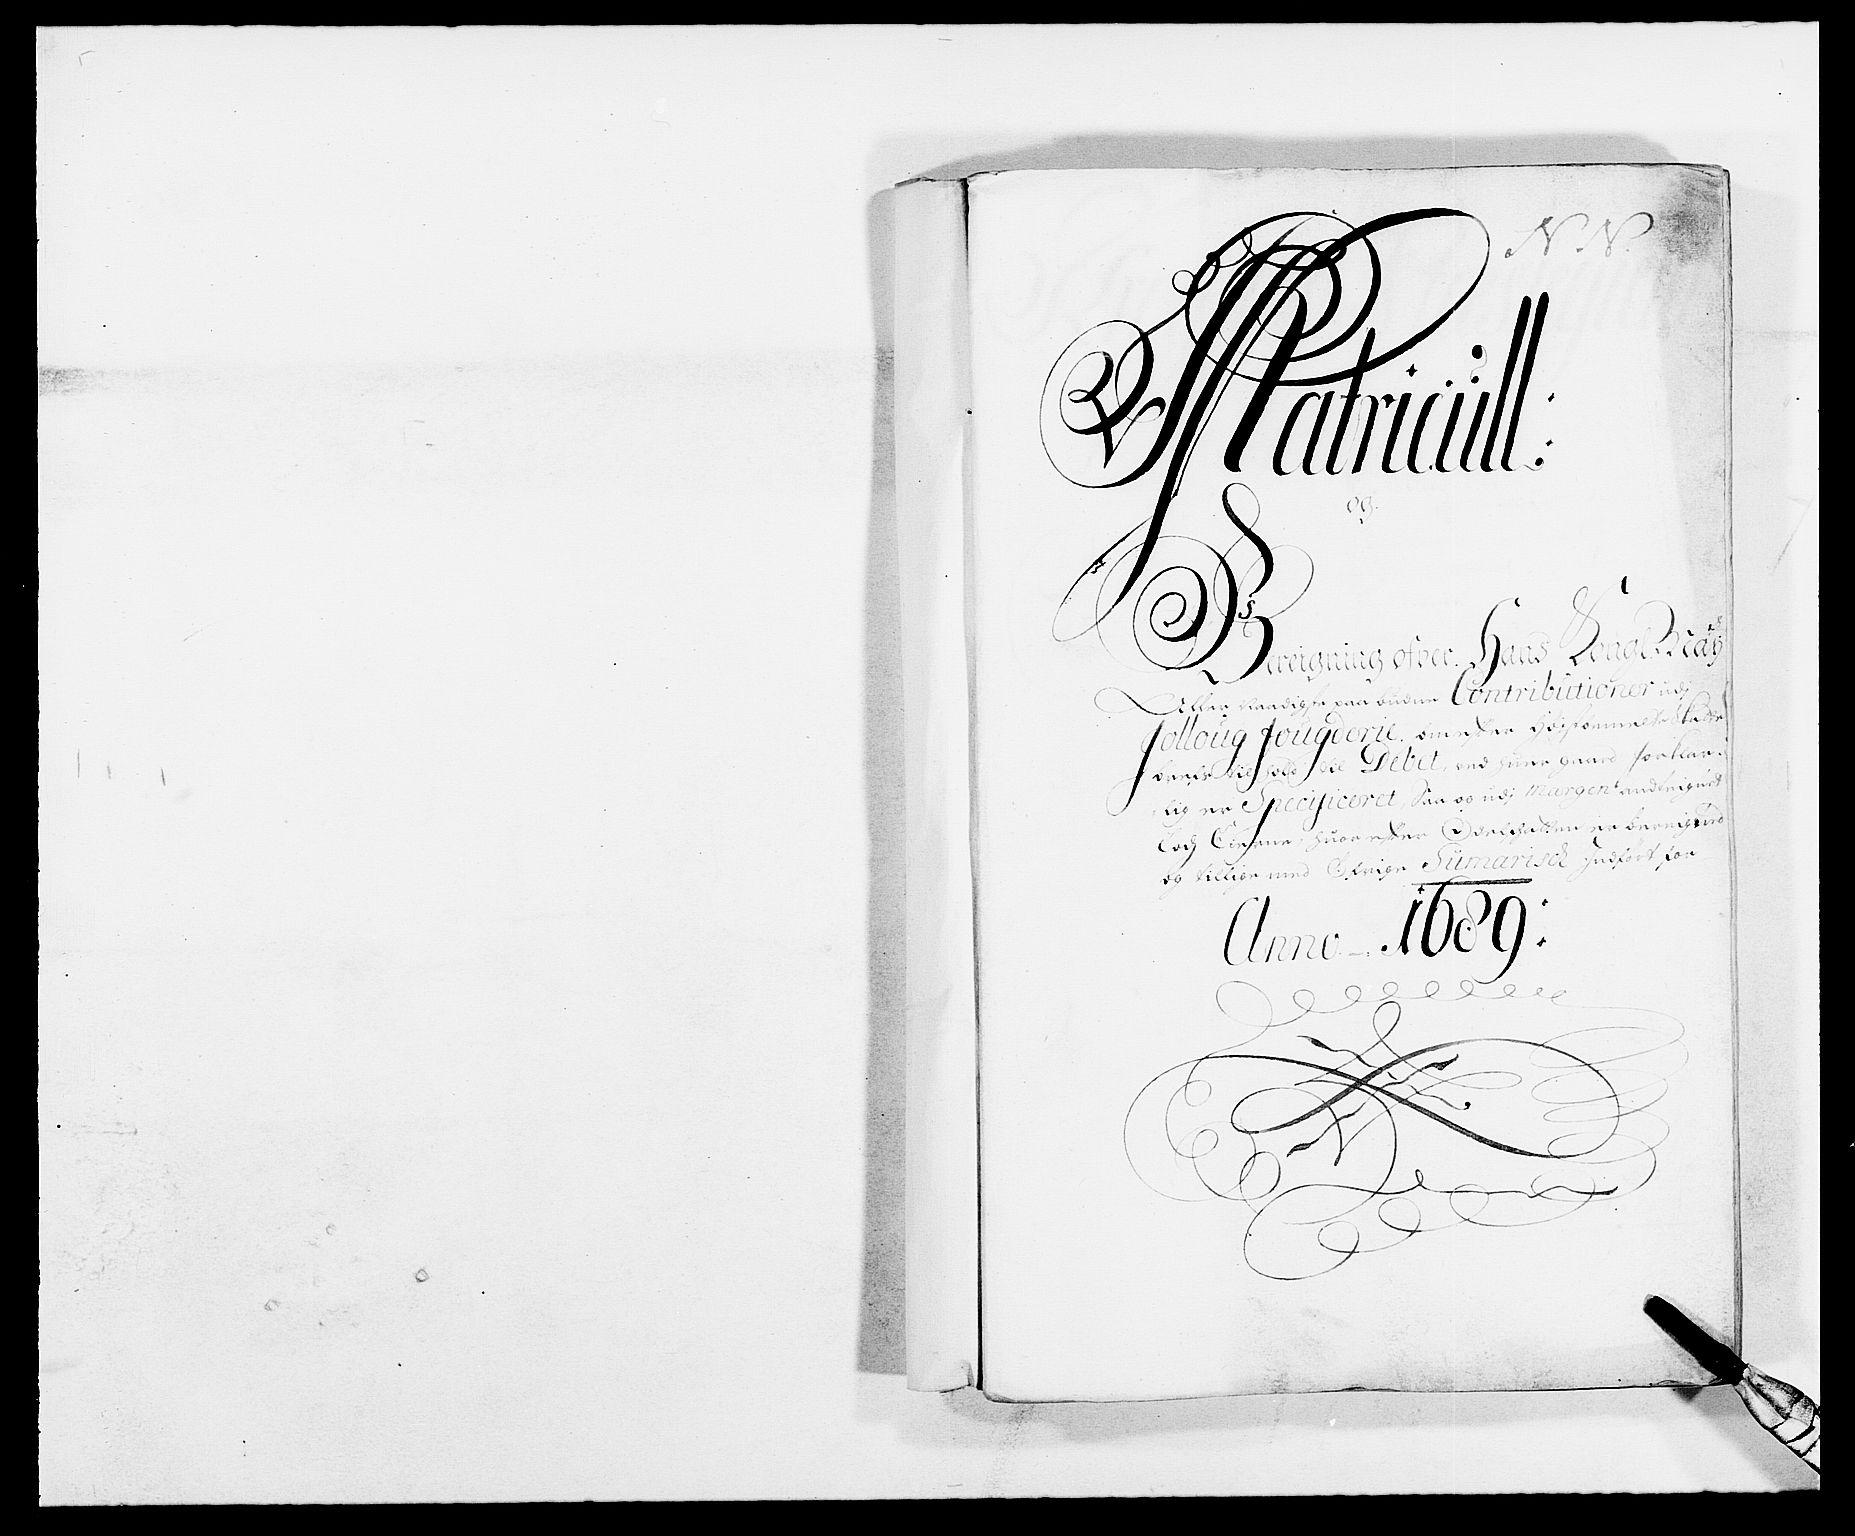 RA, Rentekammeret inntil 1814, Reviderte regnskaper, Fogderegnskap, R09/L0435: Fogderegnskap Follo, 1689-1691, s. 25